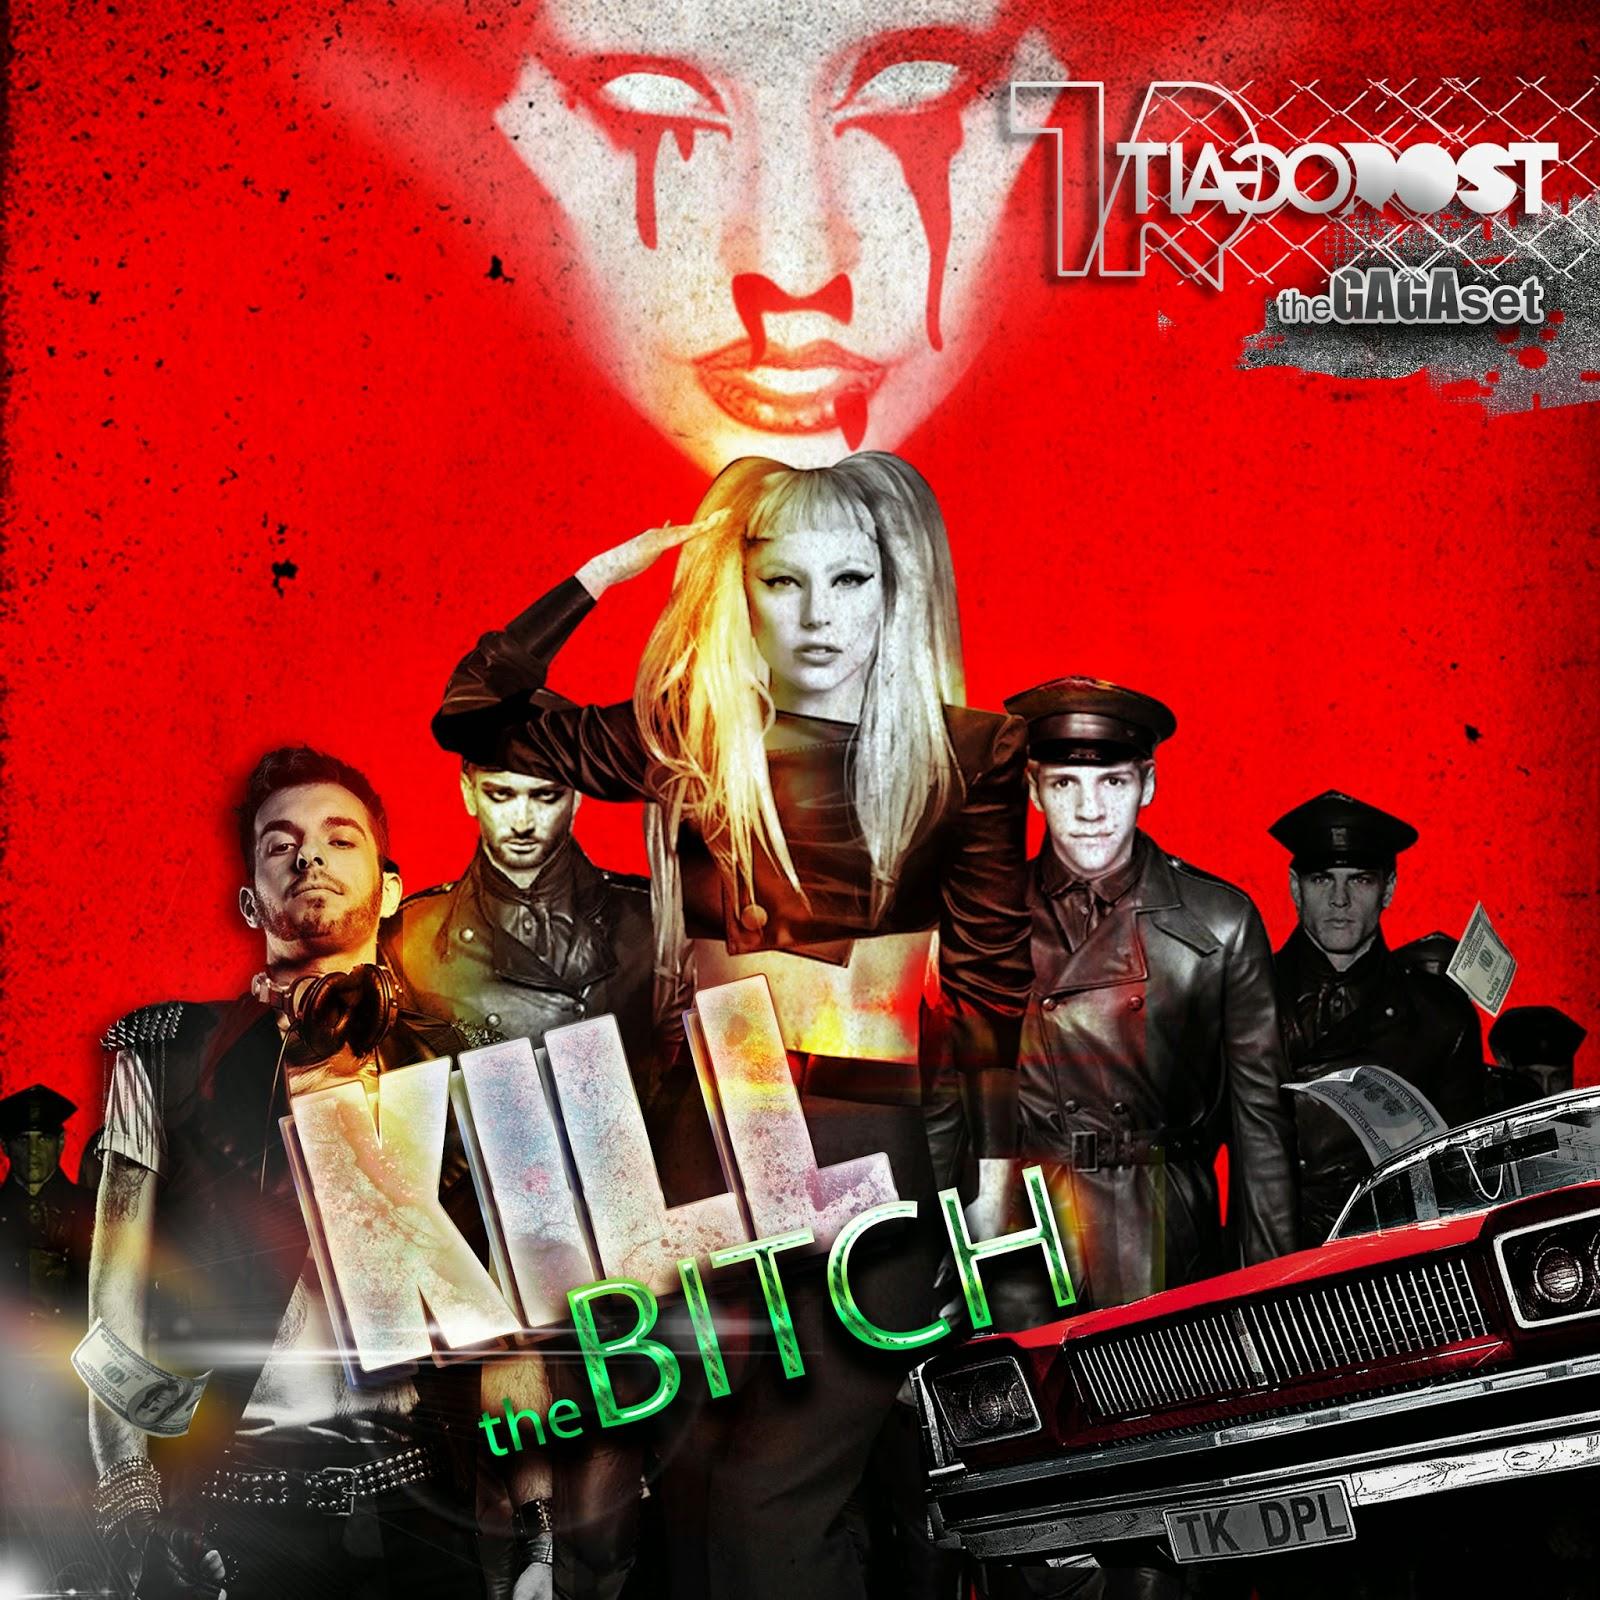 DJ Tiago Rost - KILL the BITCH ! (theGAGAset)